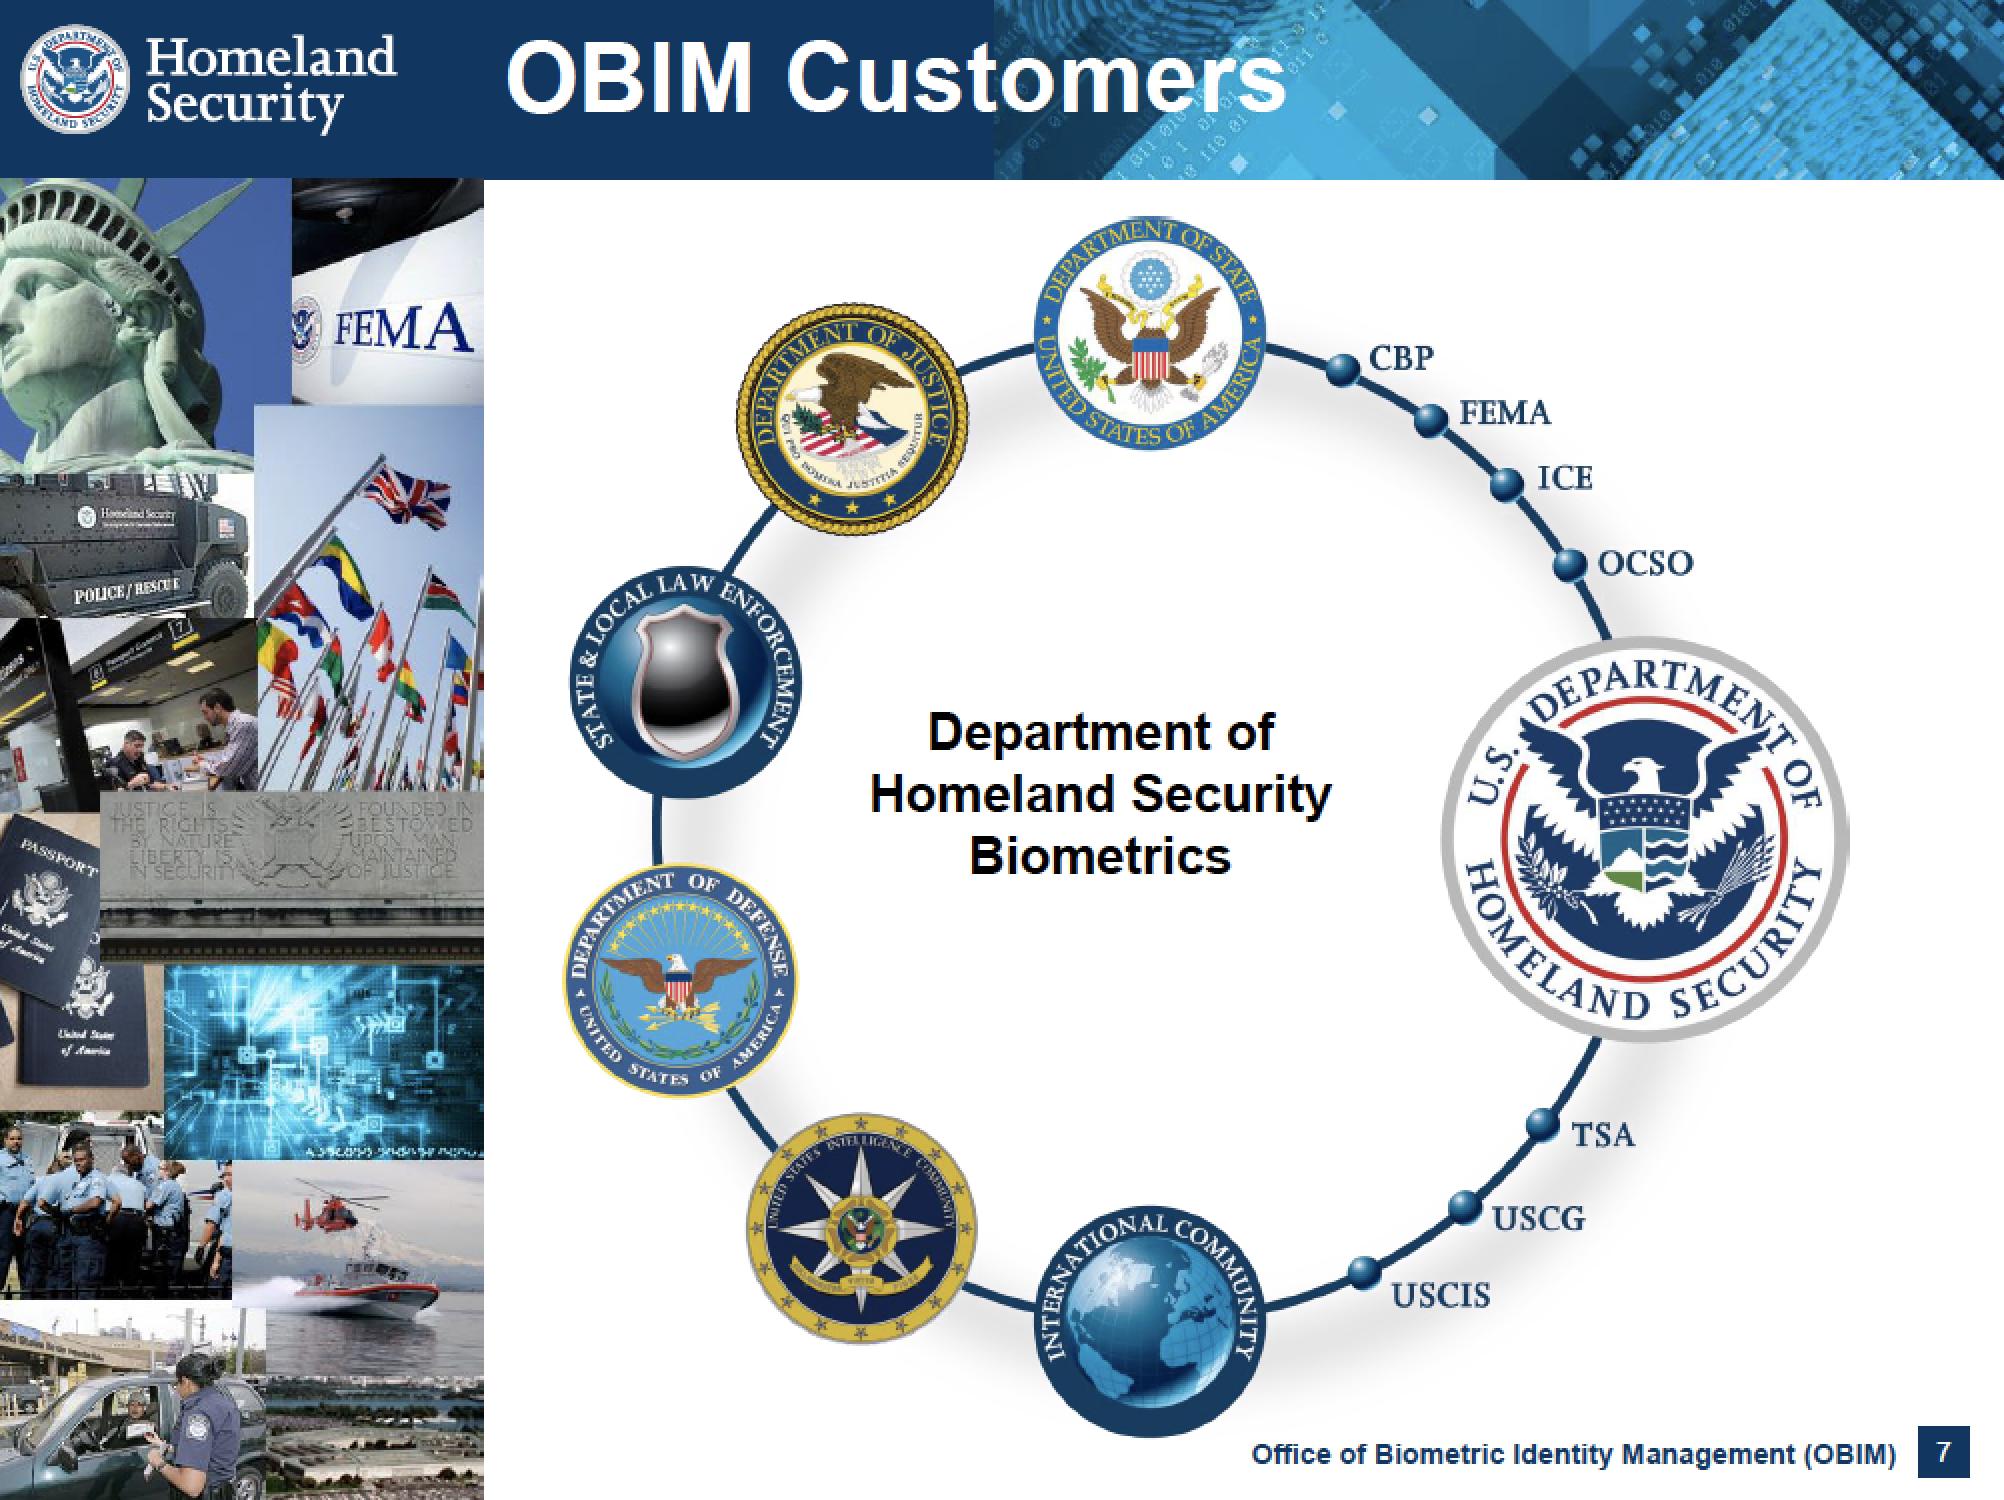 DHS Partner Agencies